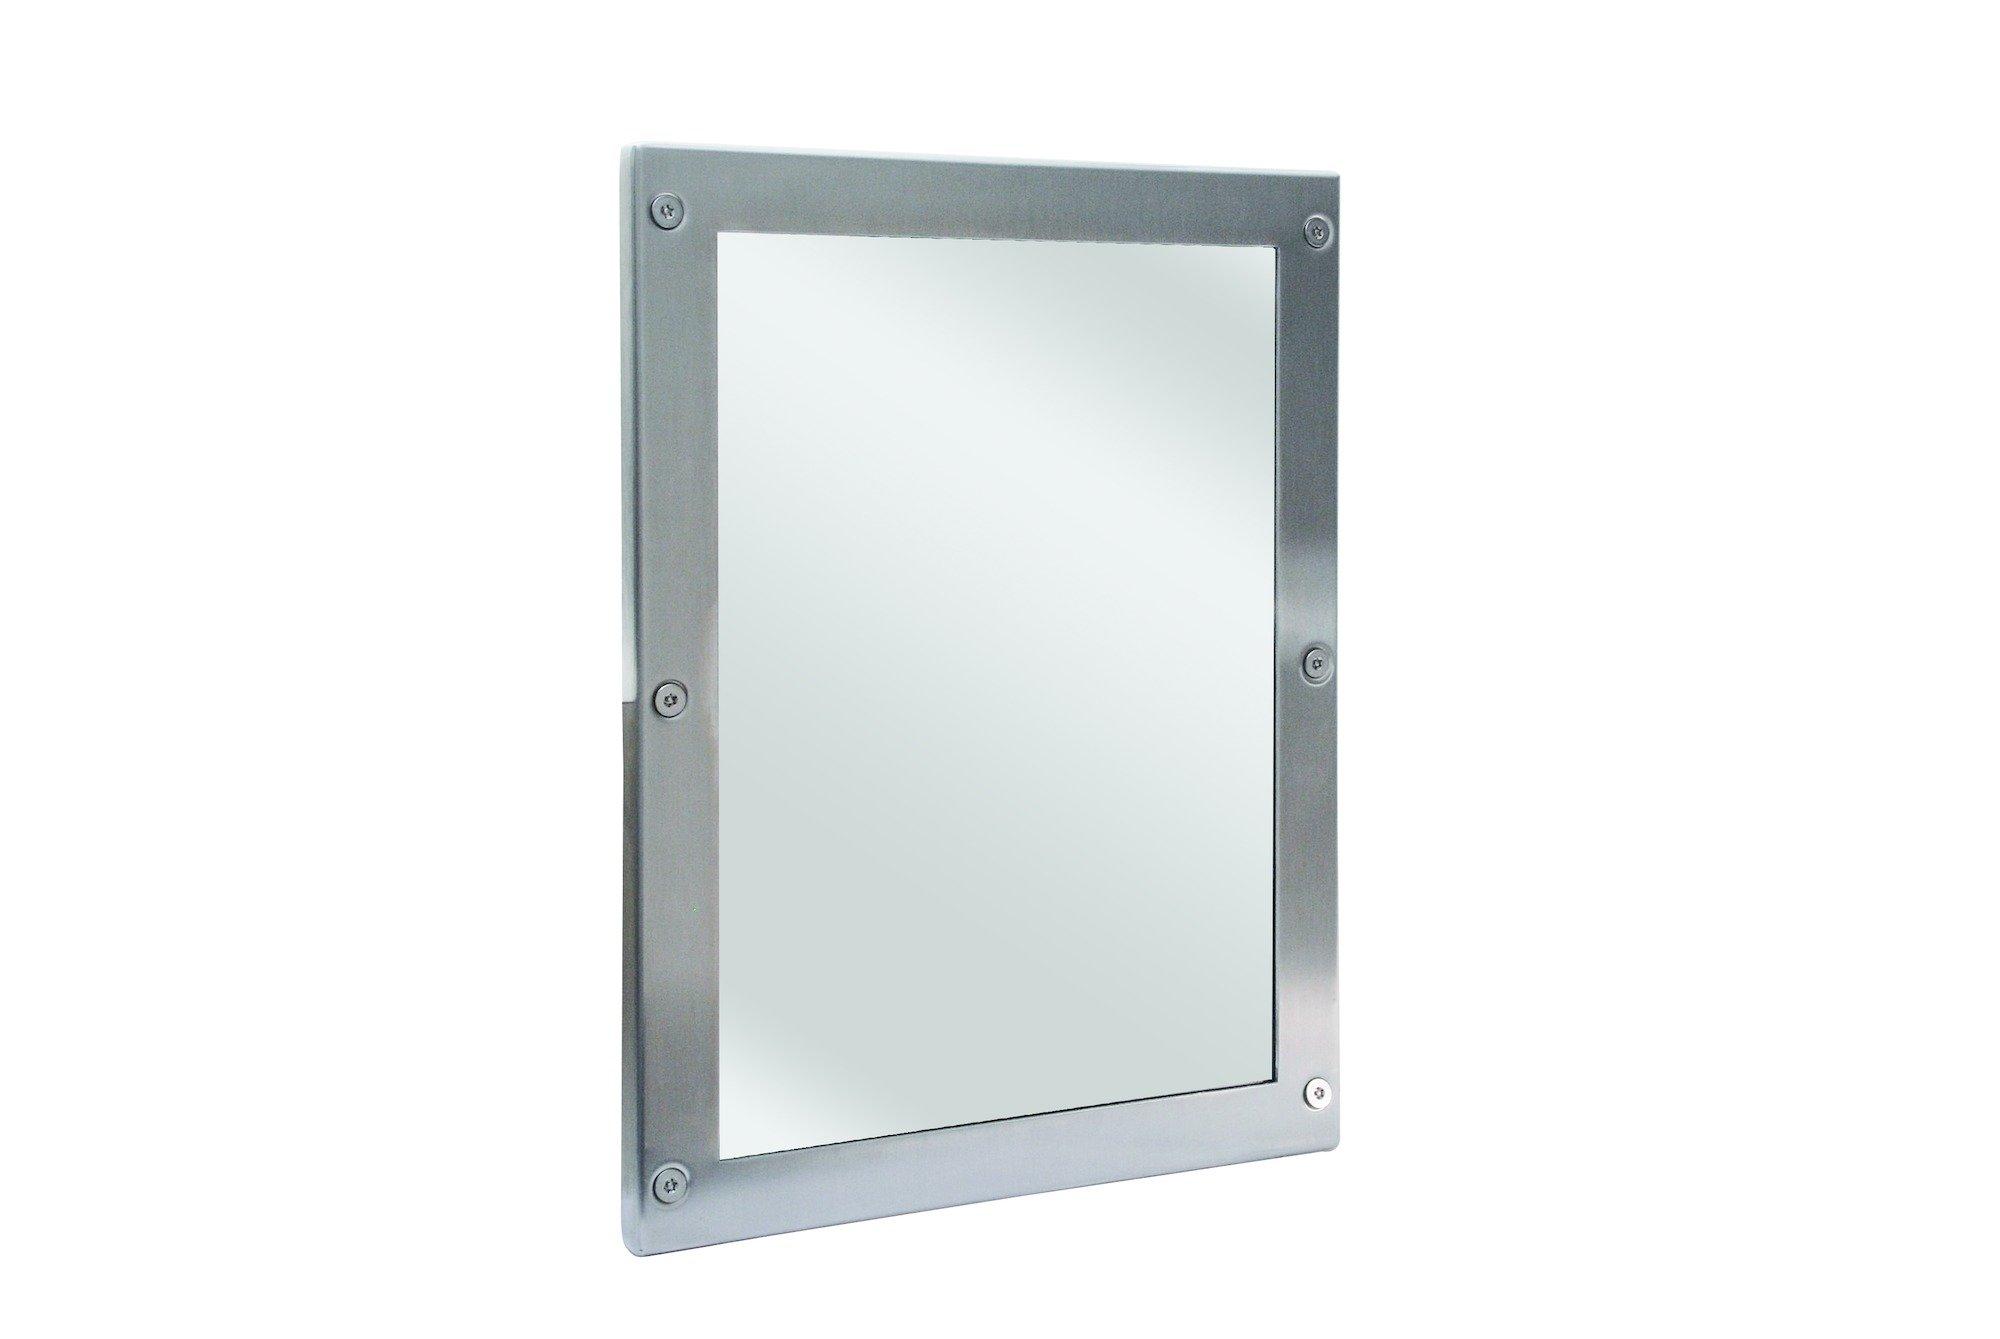 Bradley Mirror for Security SA03 | Accurate Door & Hardware, Inc.